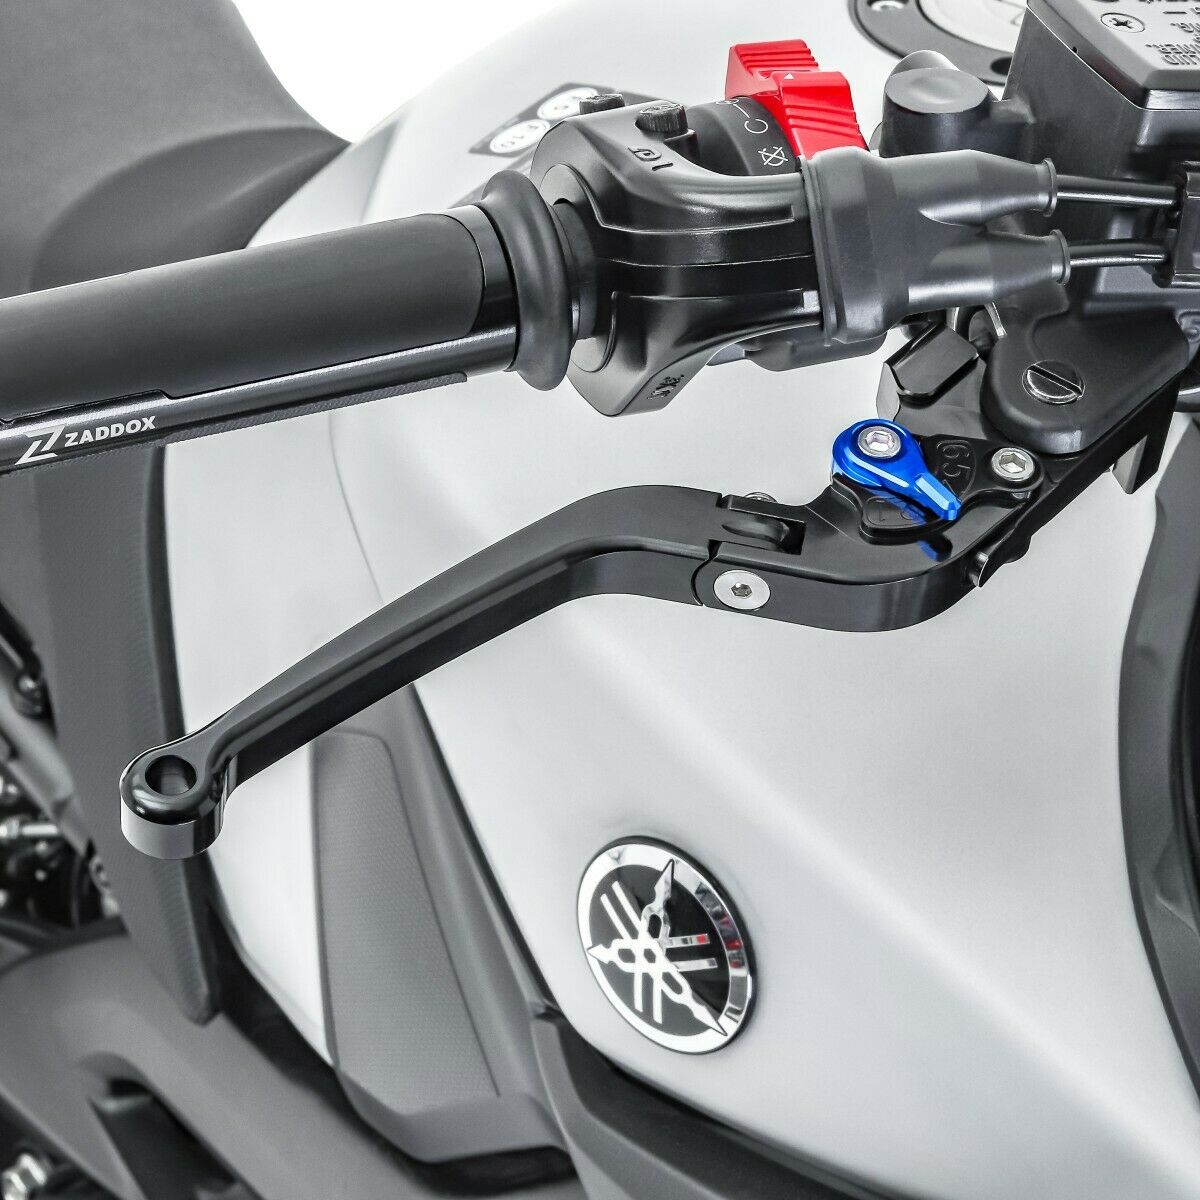 BMW F800GS 2008-2012 F800R 2009-2011 Bremshebel Handbremshebel schwarz geschmied